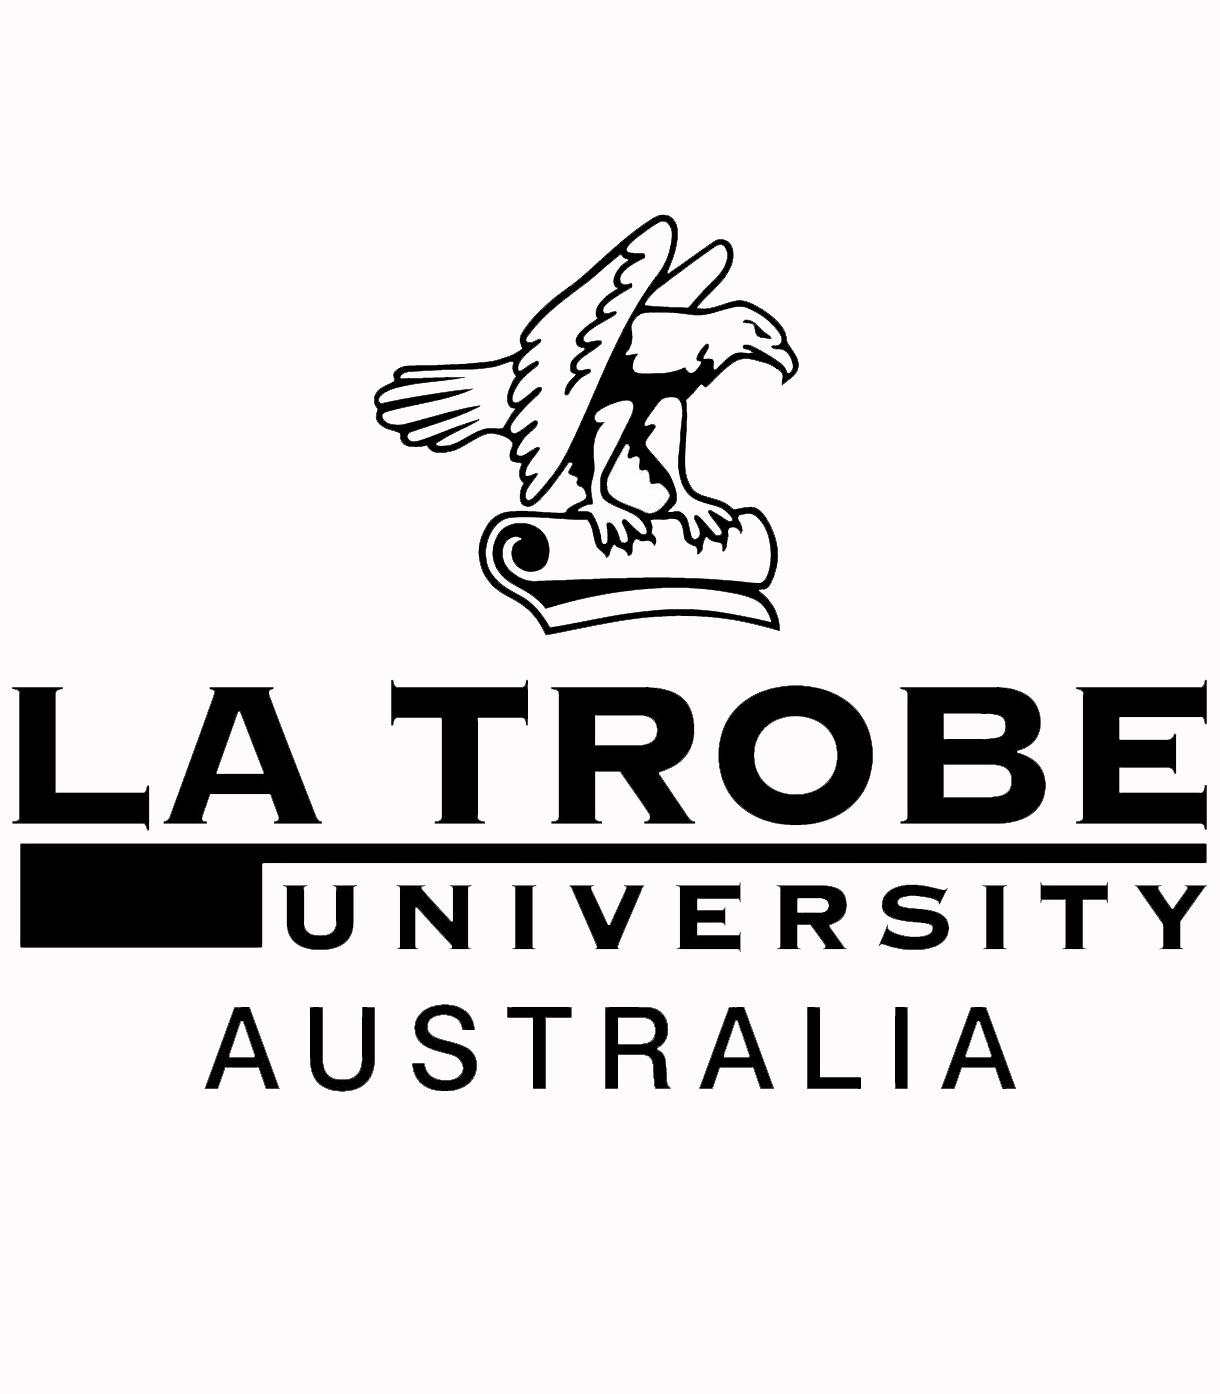 latrobe-logo.jpg